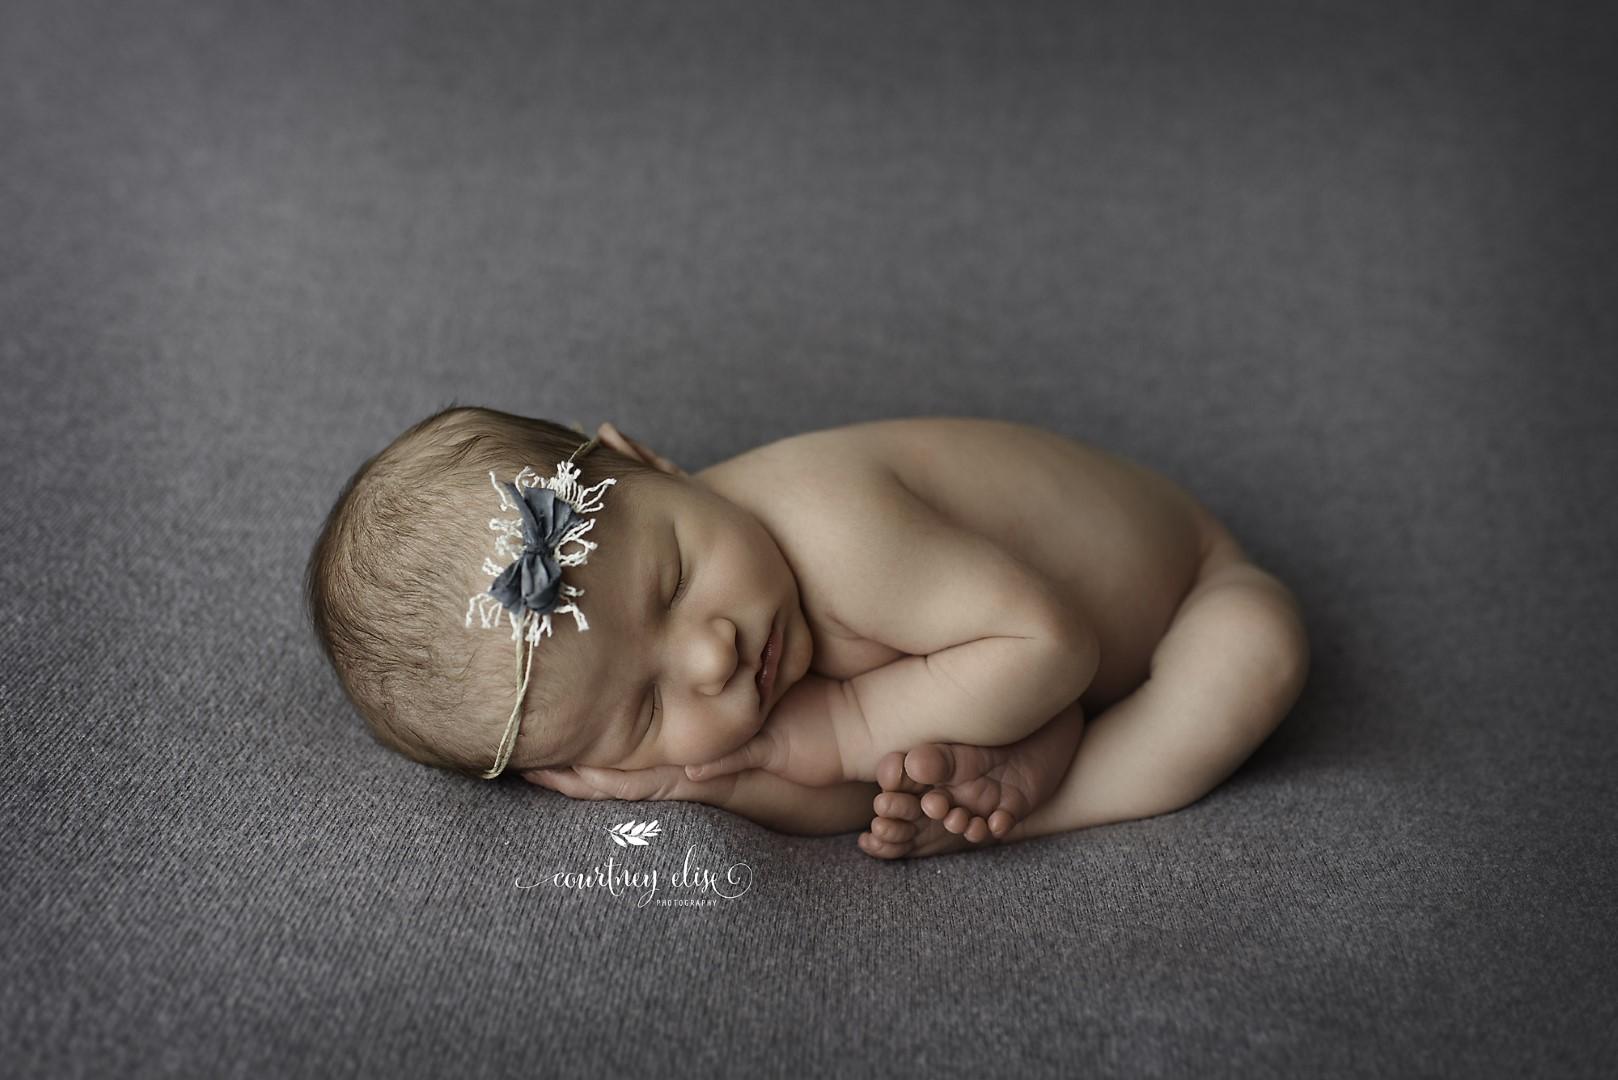 Newborn photography studio session canton ga gabriella courtney elise photography